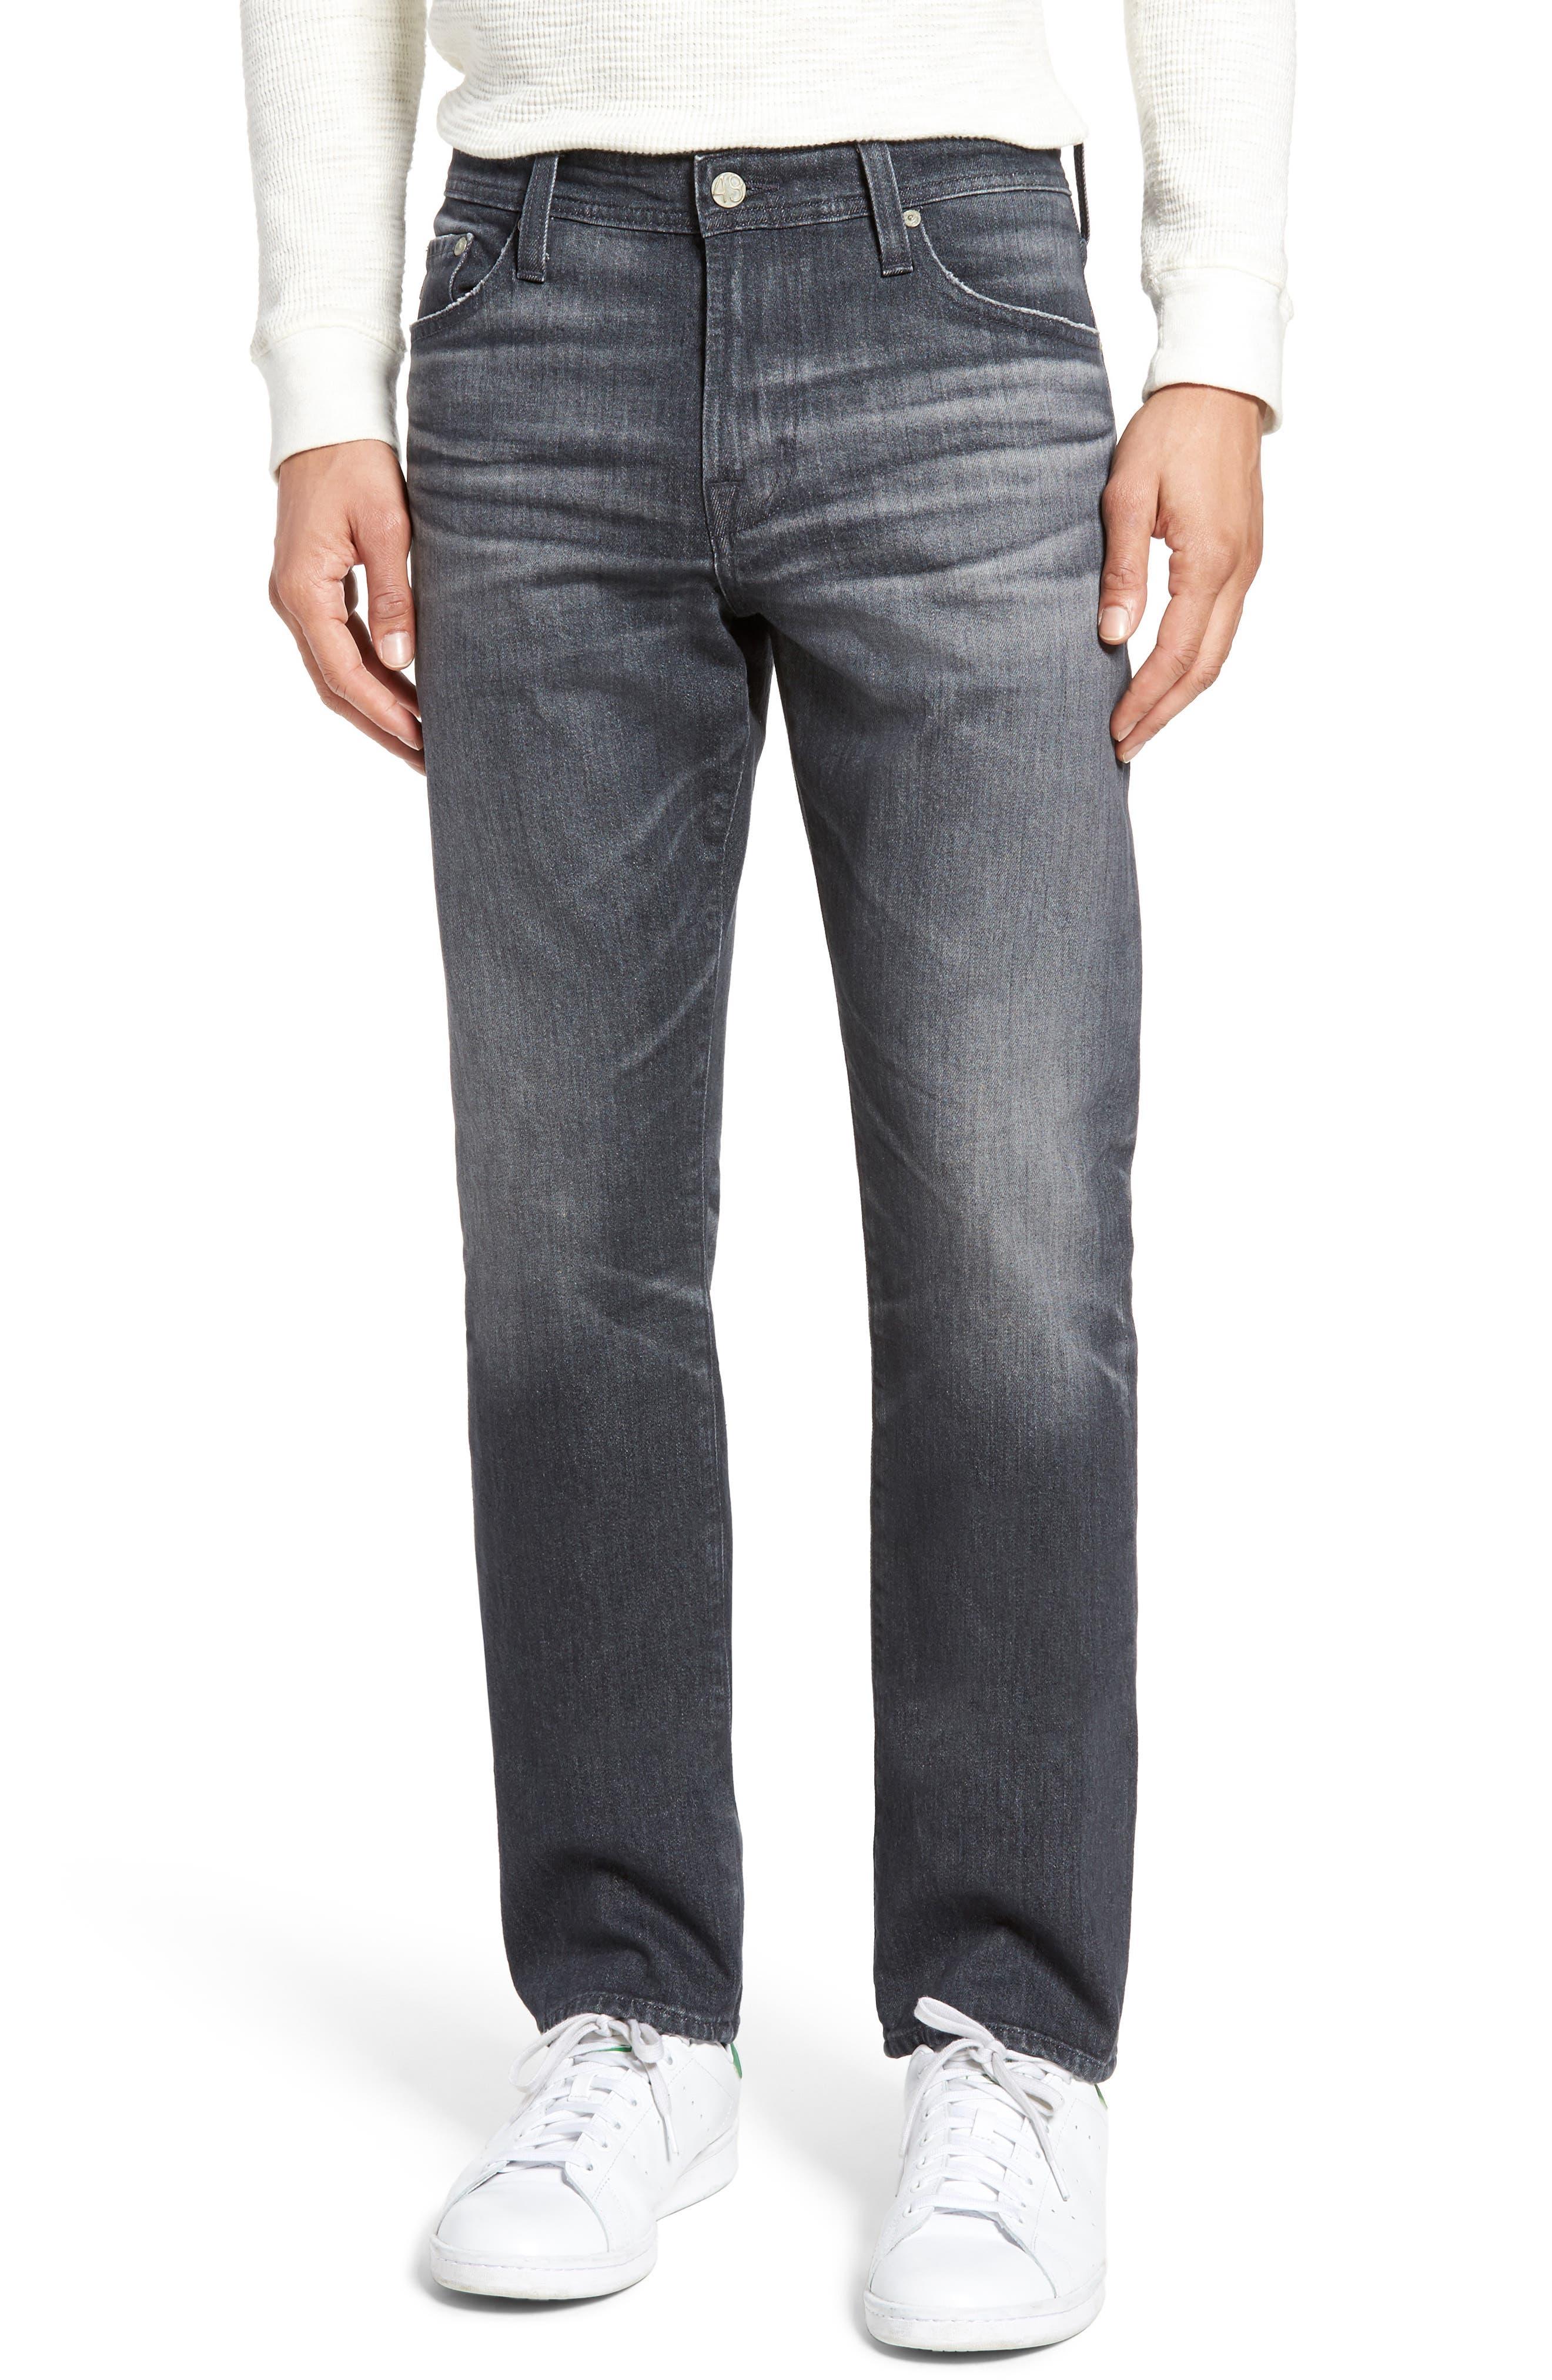 Everett Slim Straight Leg Jeans,                         Main,                         color, 023